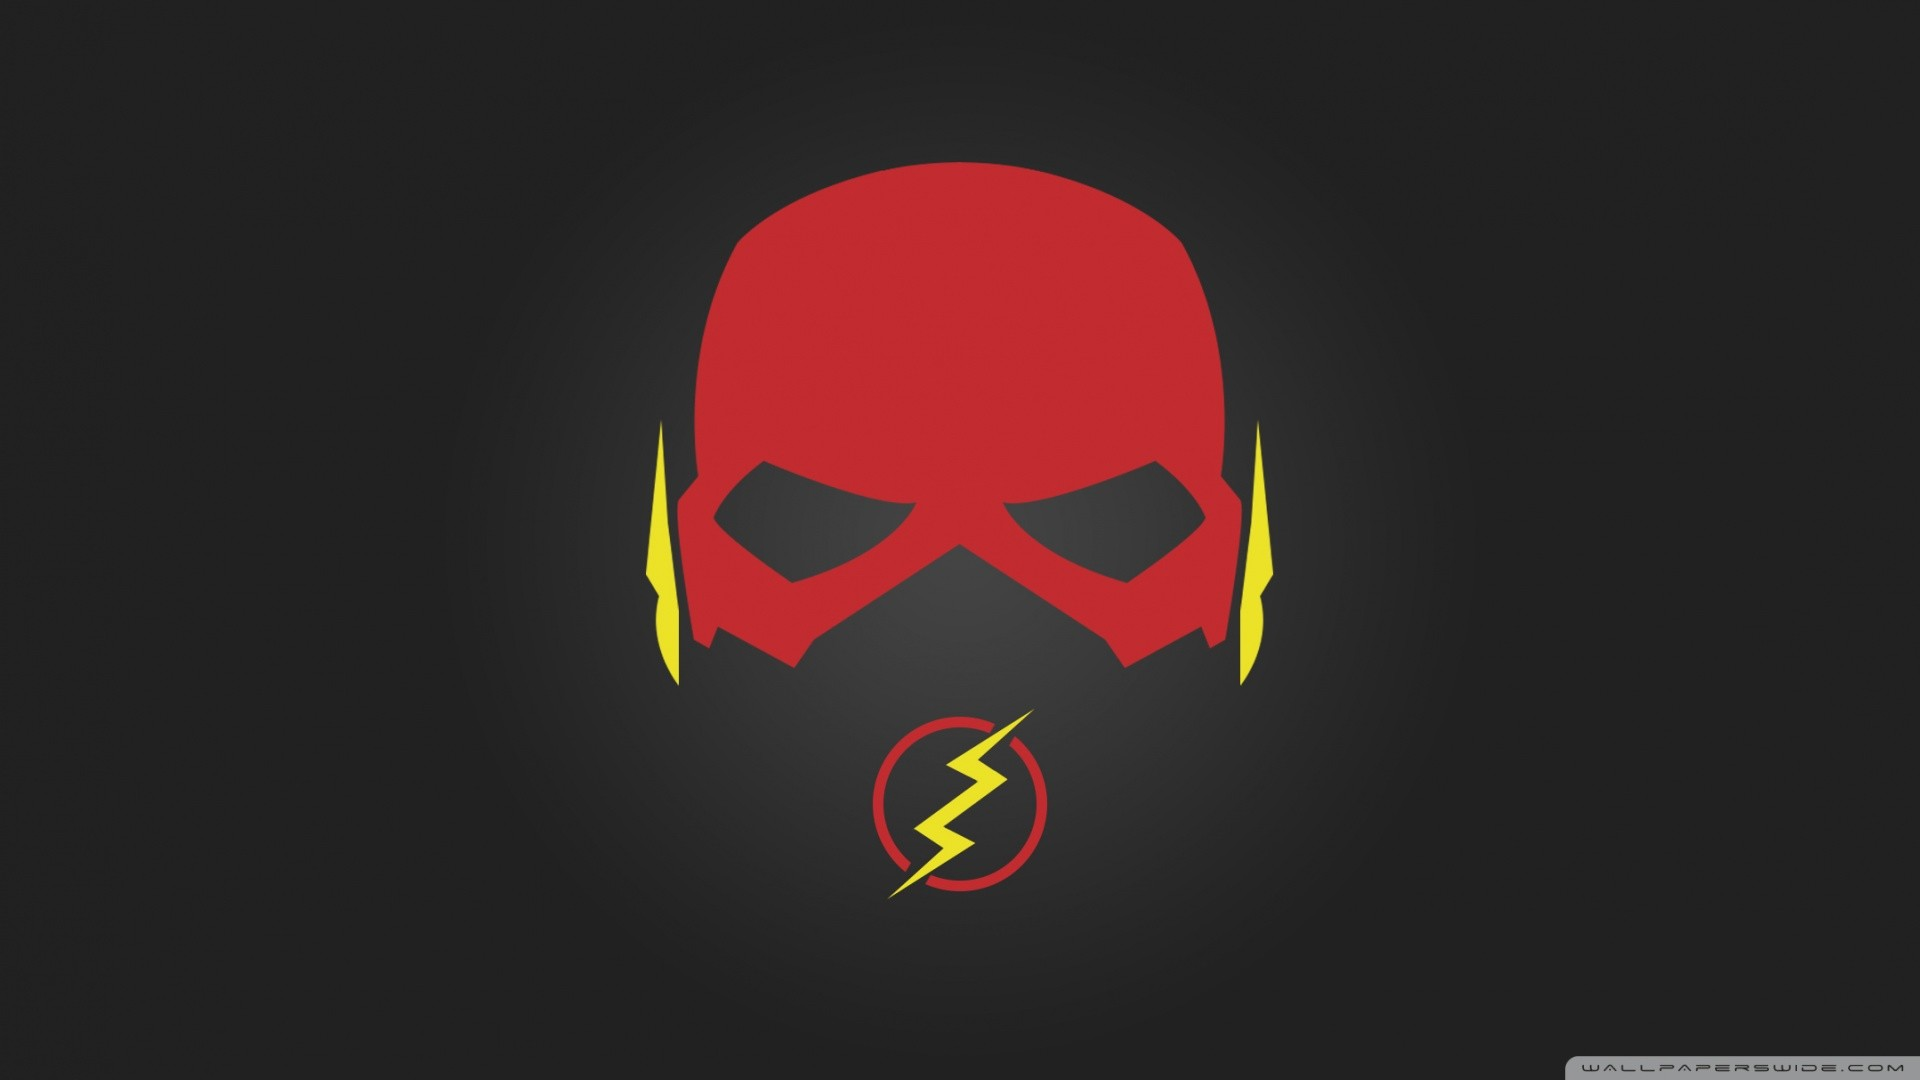 Flash Logo iPhone 6 Wallpaper HD HD 16:9 .